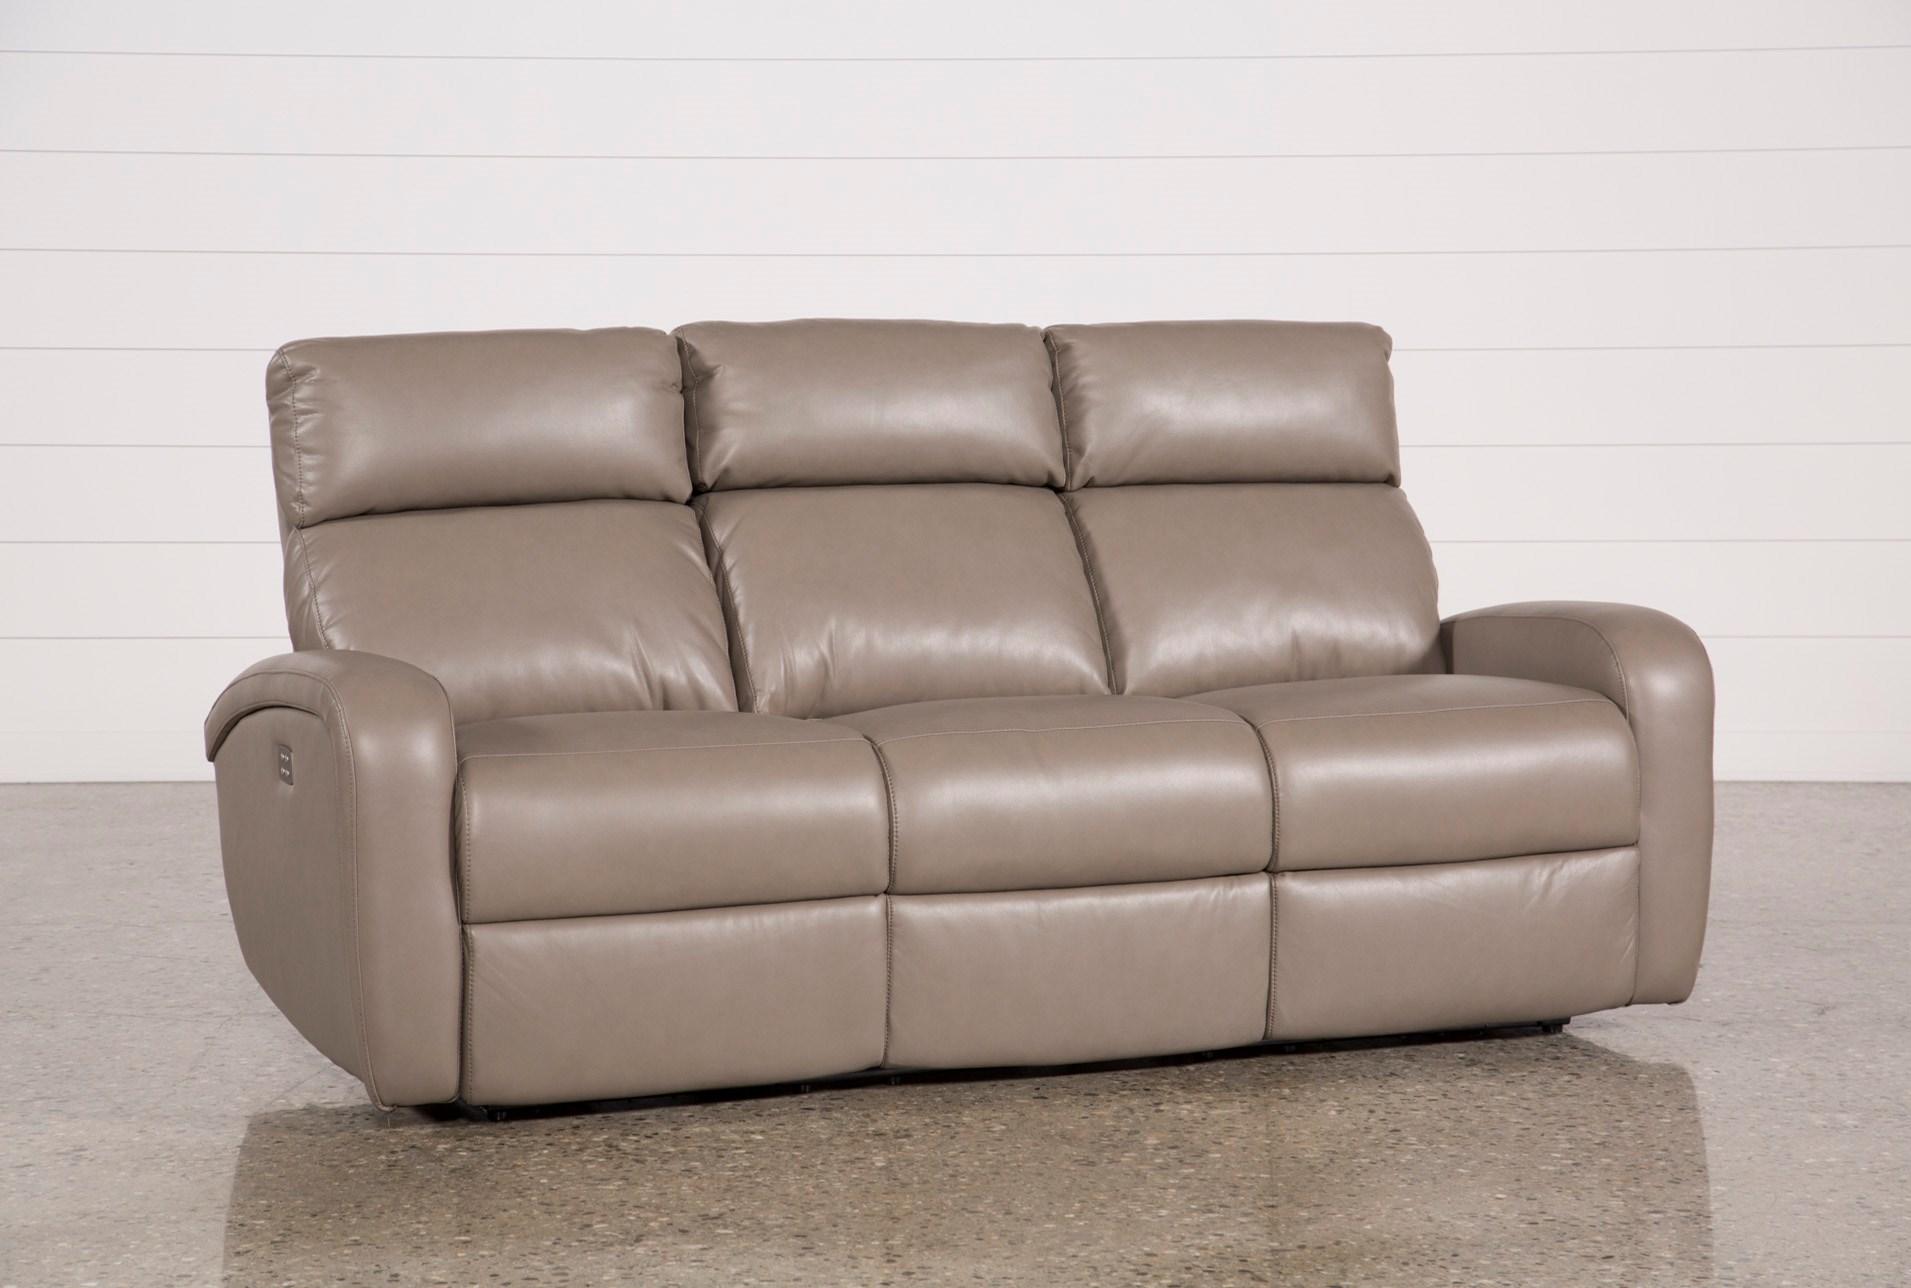 Darwin Taupe Power Reclining Sofa